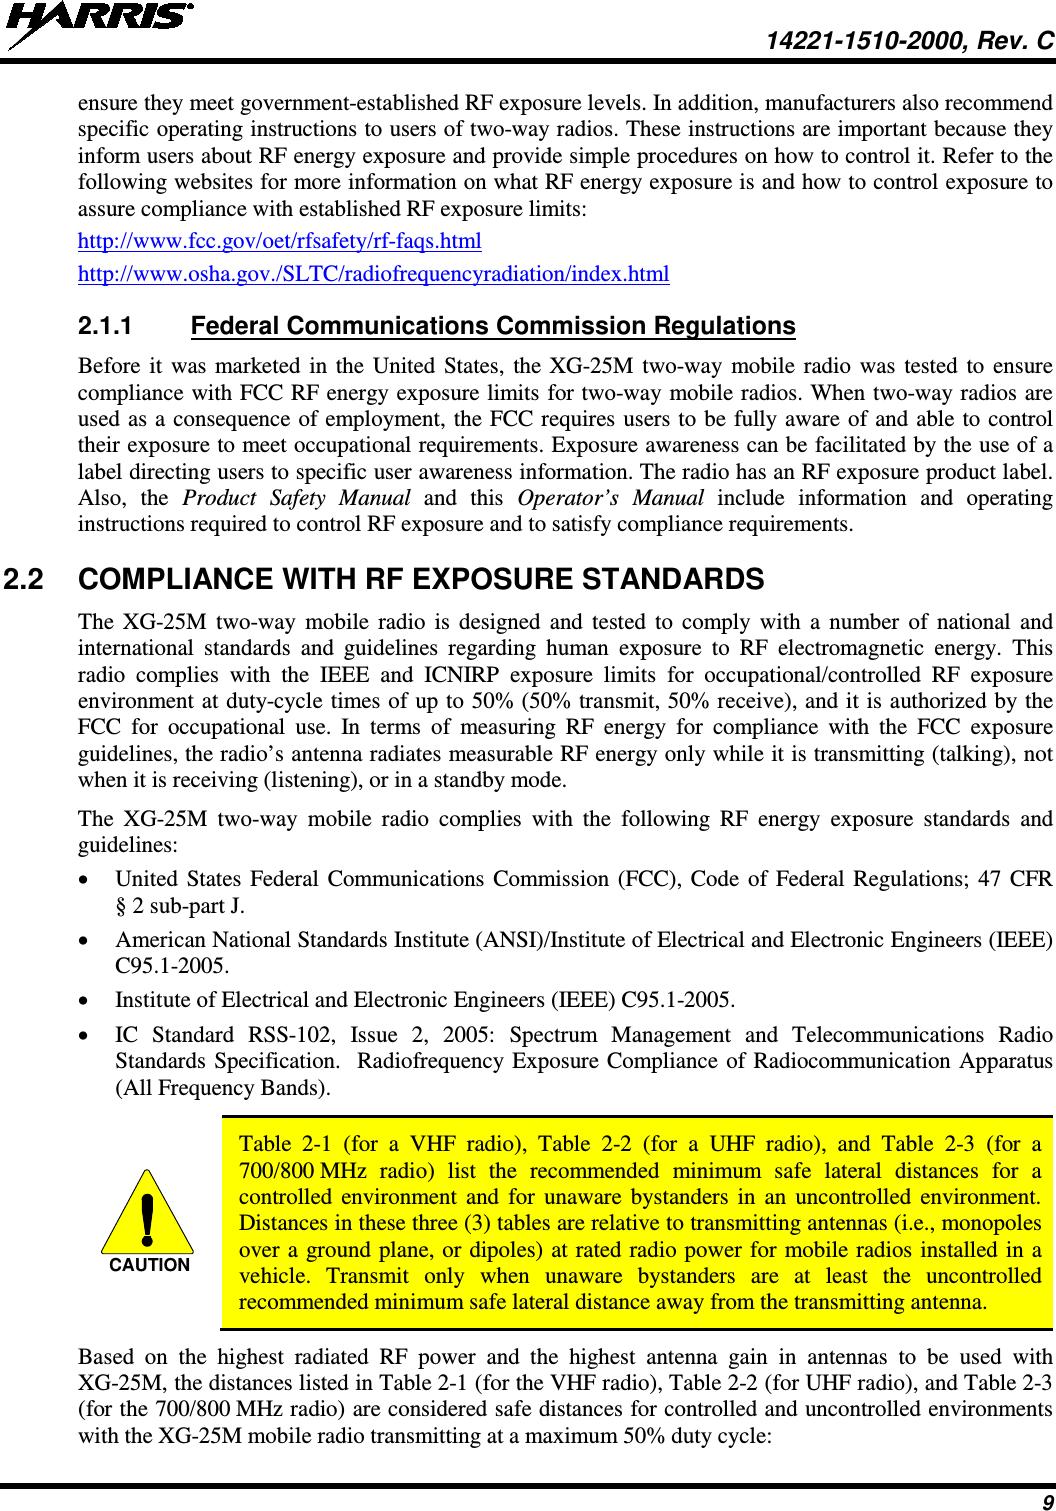 standard operating procedures user guides instruction booklets